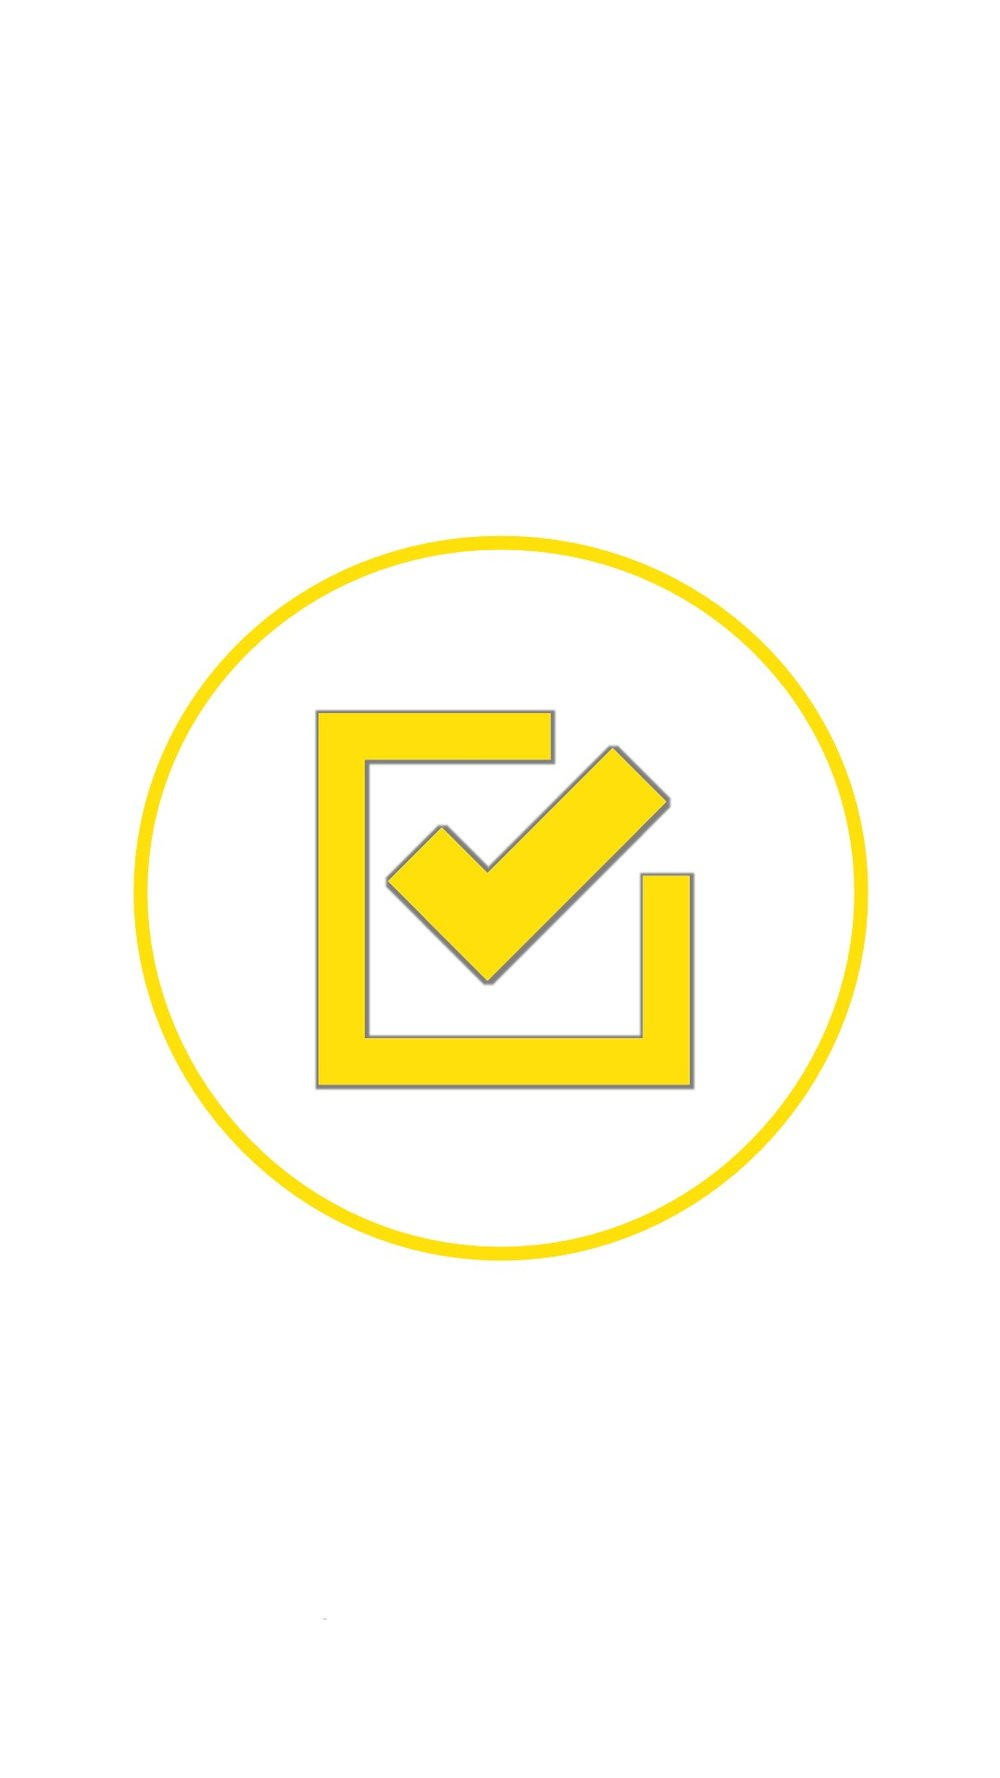 Instagram-cover-task-yellow-lotnotes.com.jpg